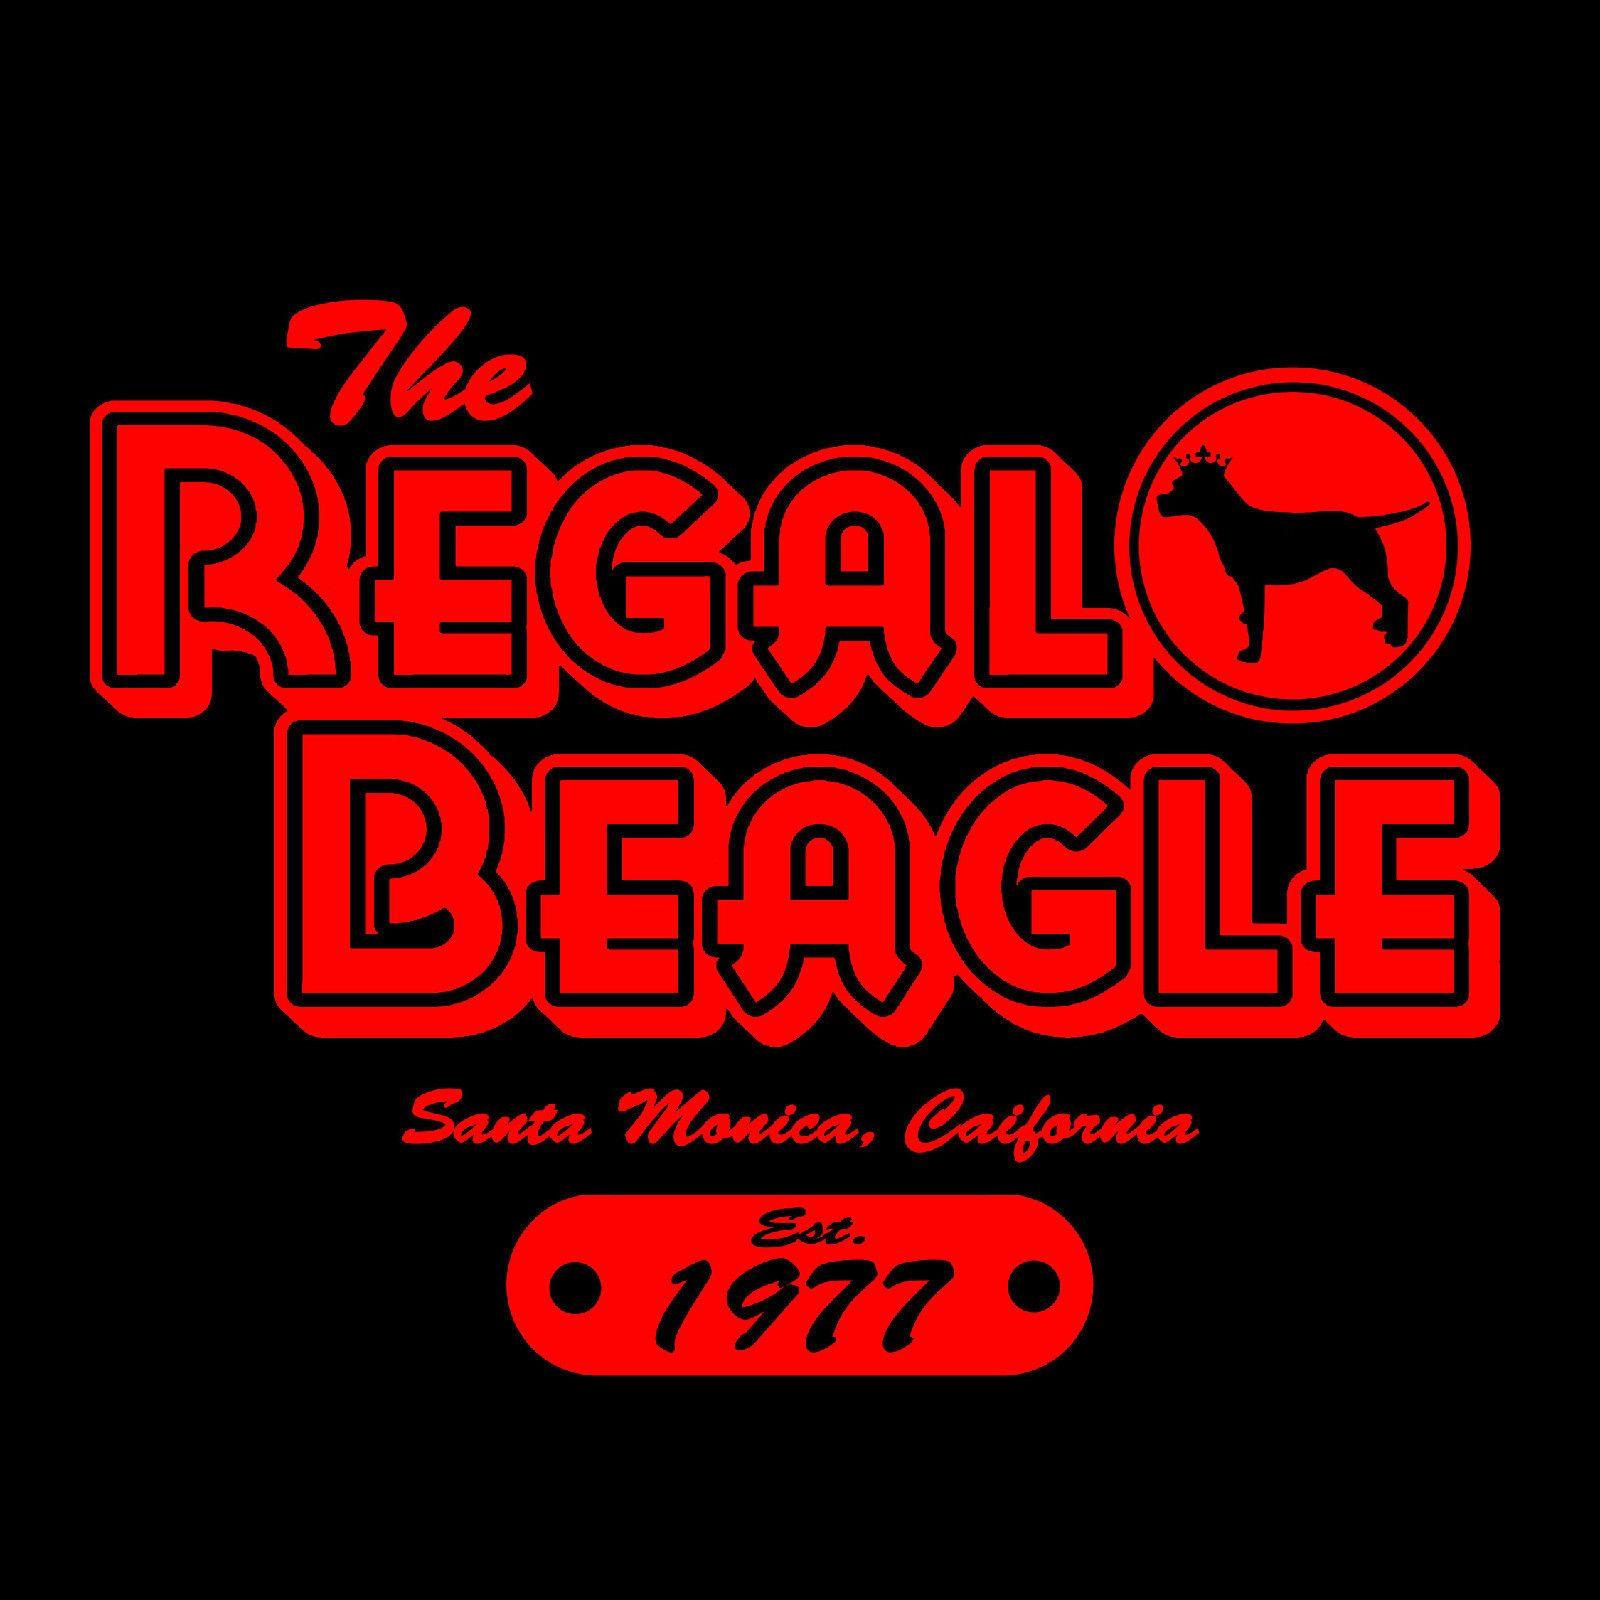 The Regal Beagle T Shirt Three S Company John Ritter Three S